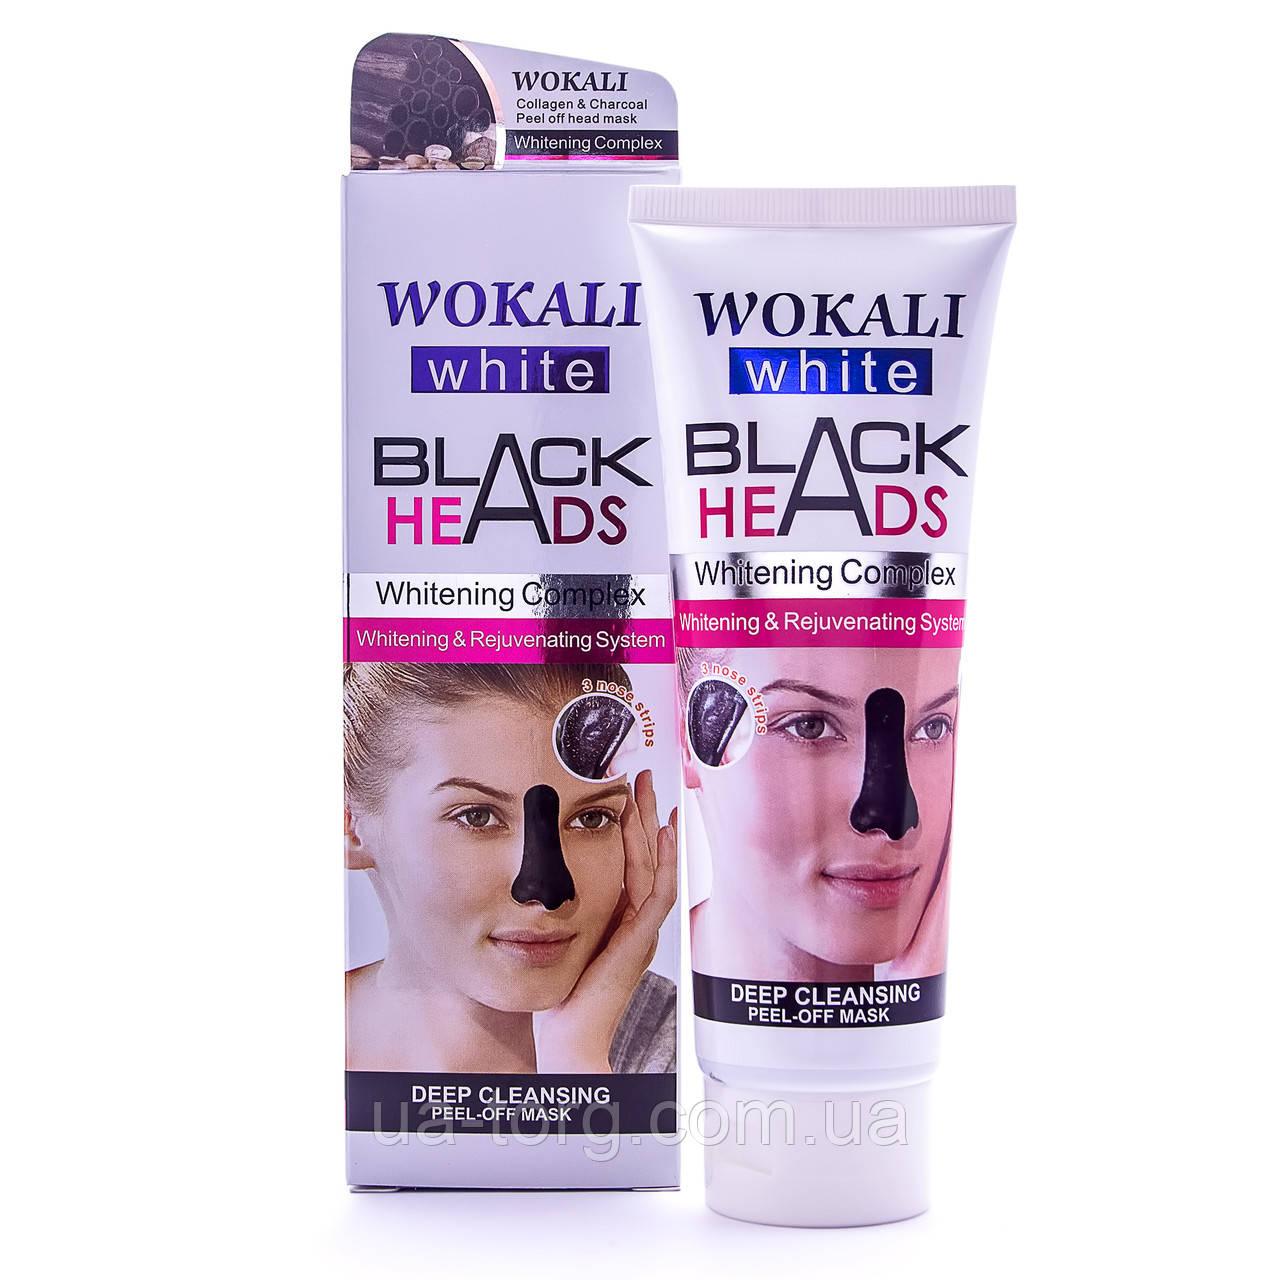 Маска-пленка от черных точек Wokali Blackheads